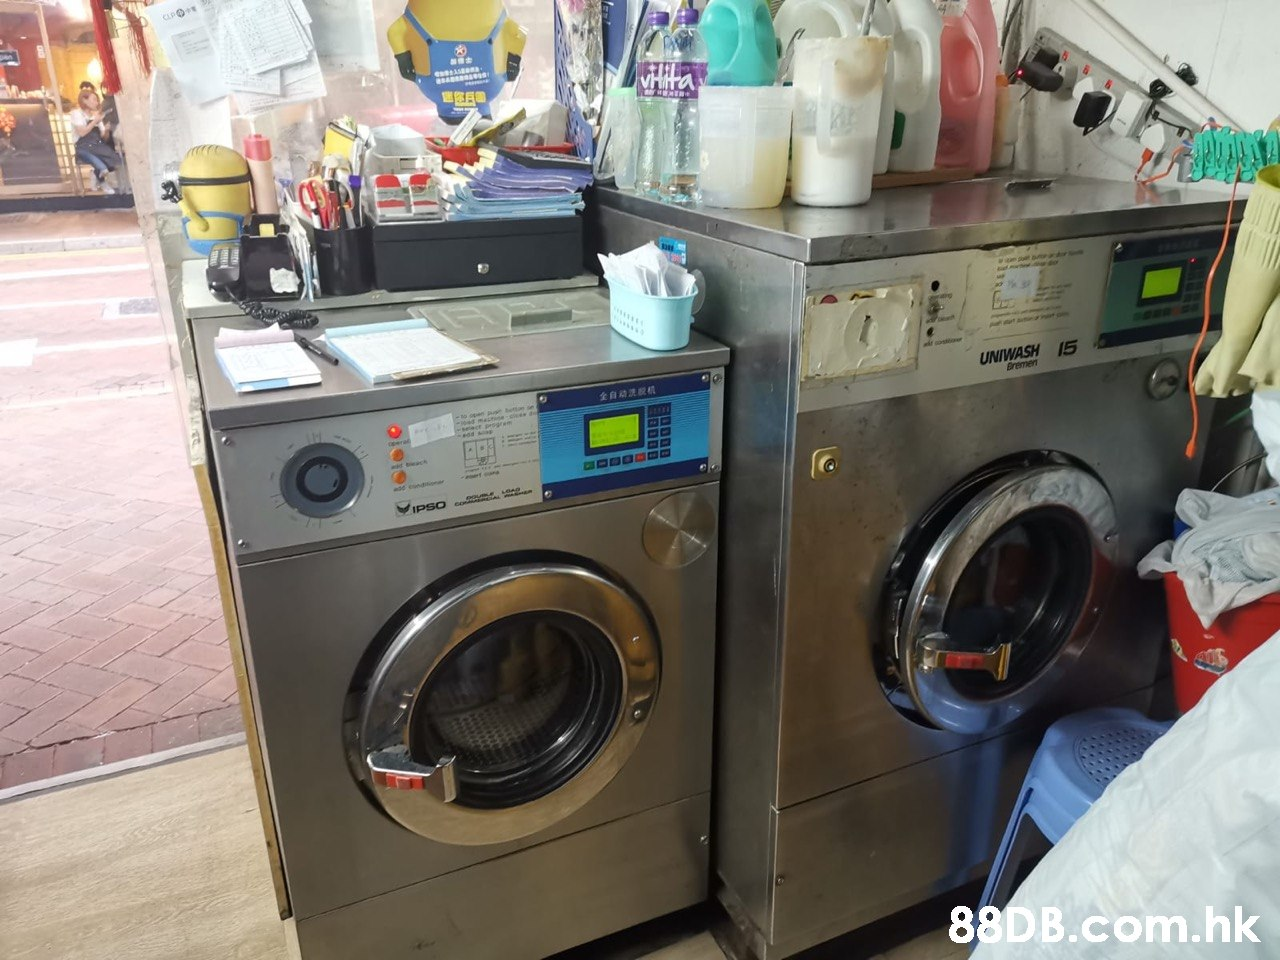 CLP VHita SA UNIWASH 15 Bremen IPSO co 9 .hk AI  Washing machine,Laundry,Major appliance,Clothes dryer,Laundry room